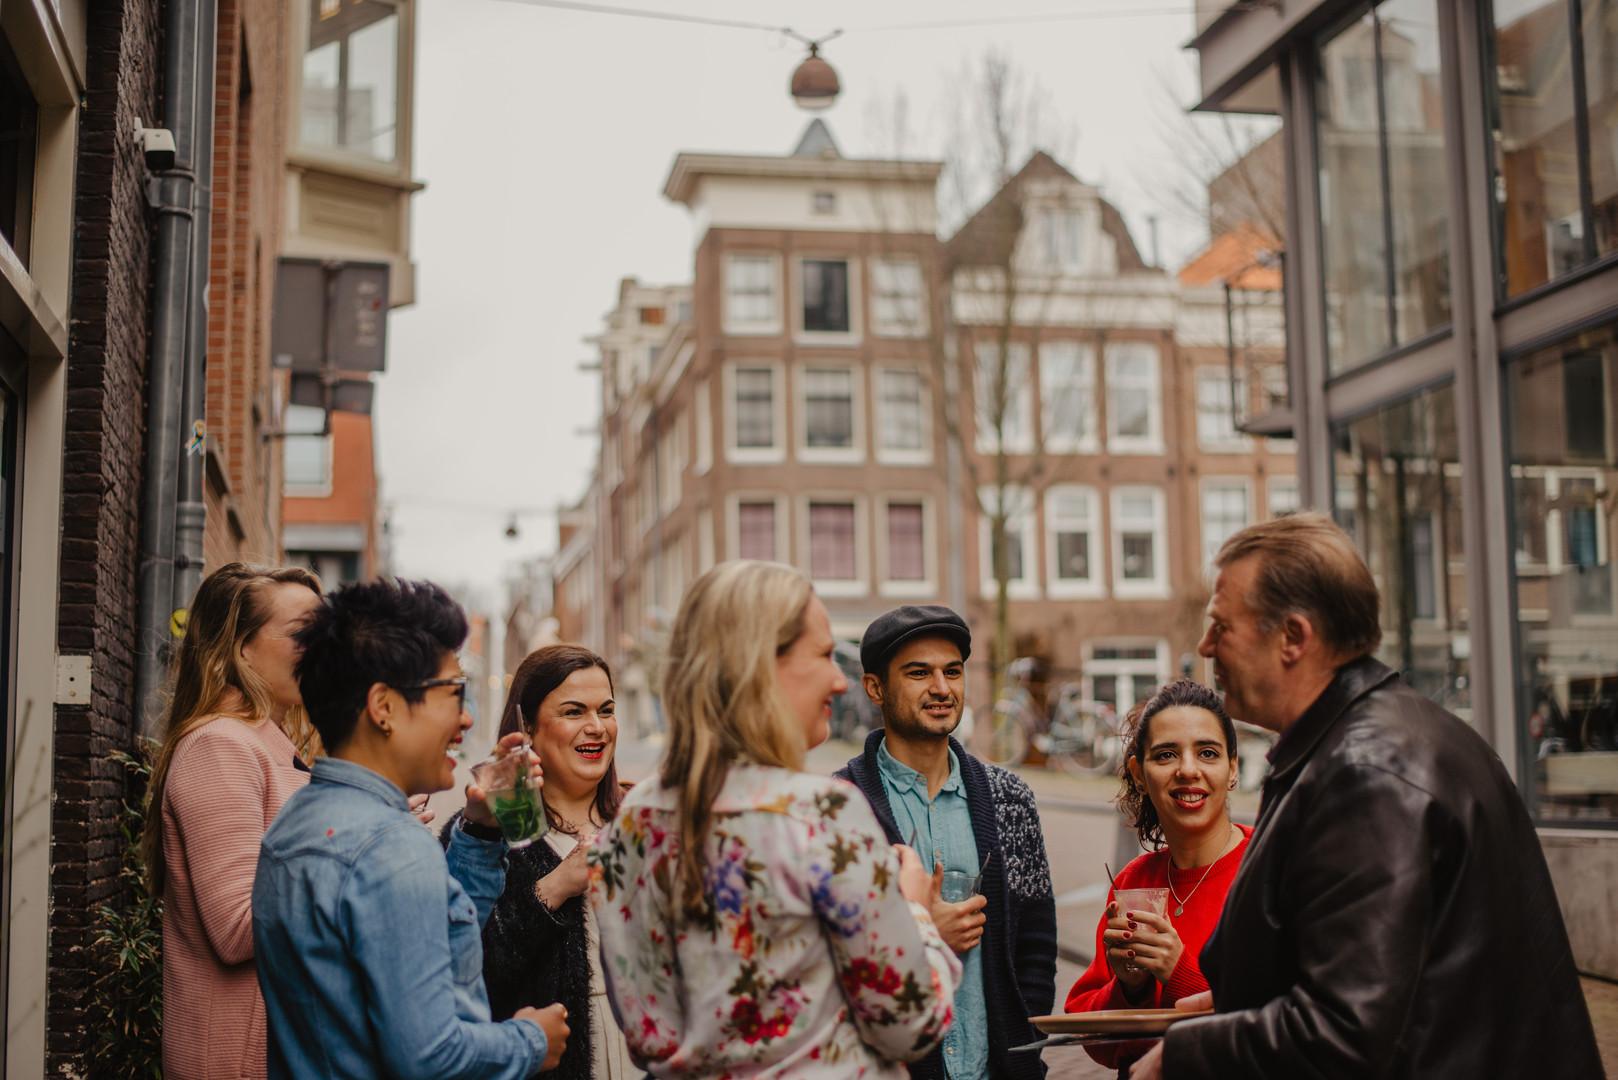 Meeting Ludo, a cannabis shop owner, in De Jordaan neighbourhood